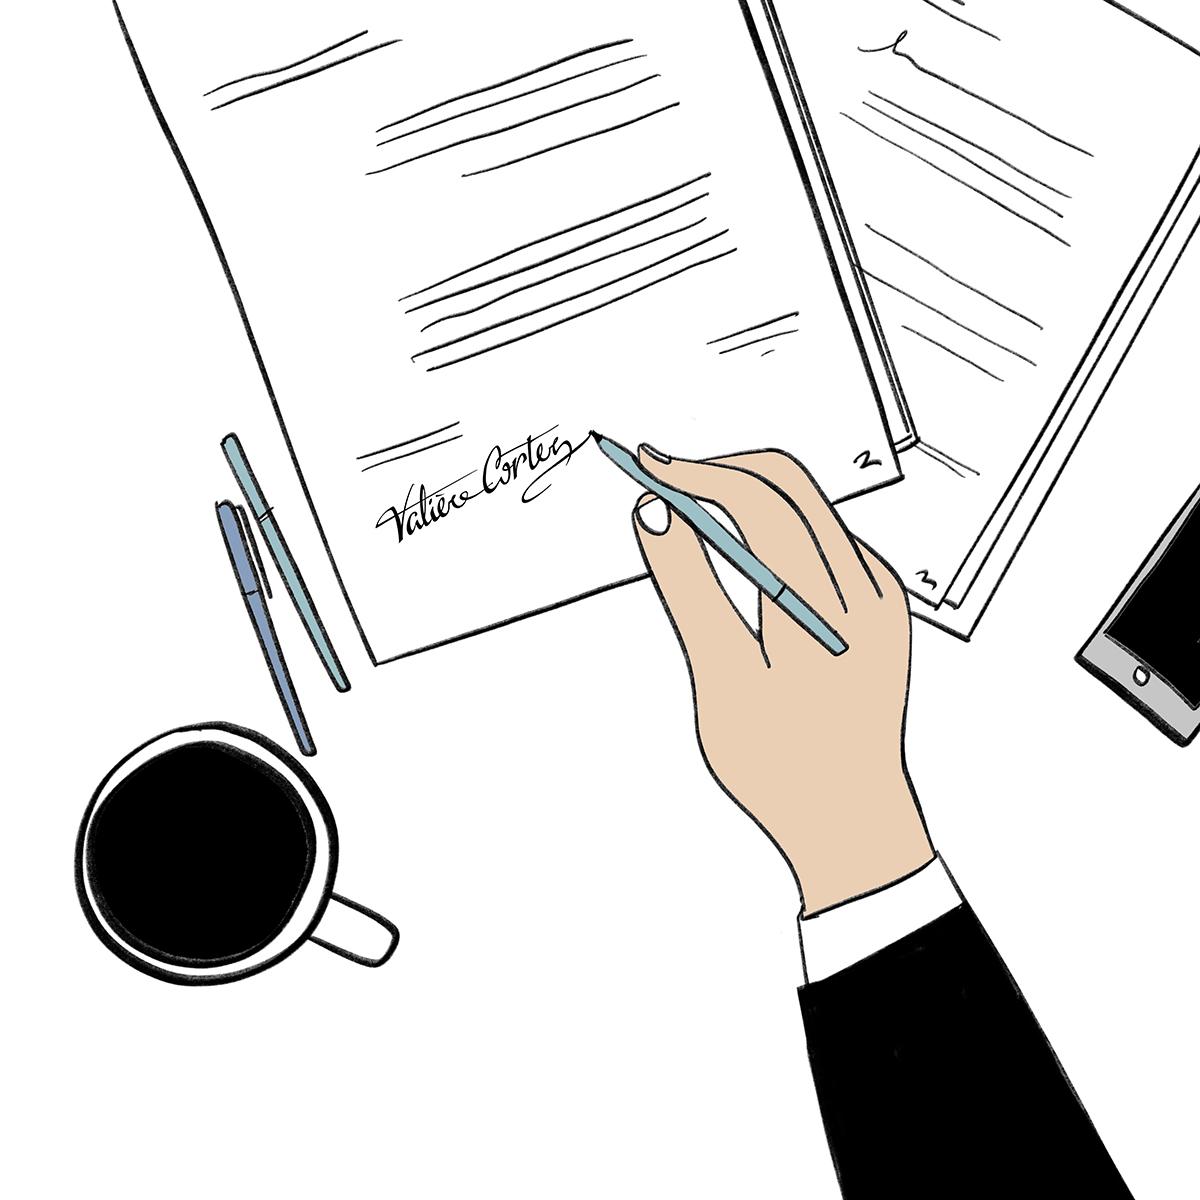 valiere-cortez-signature